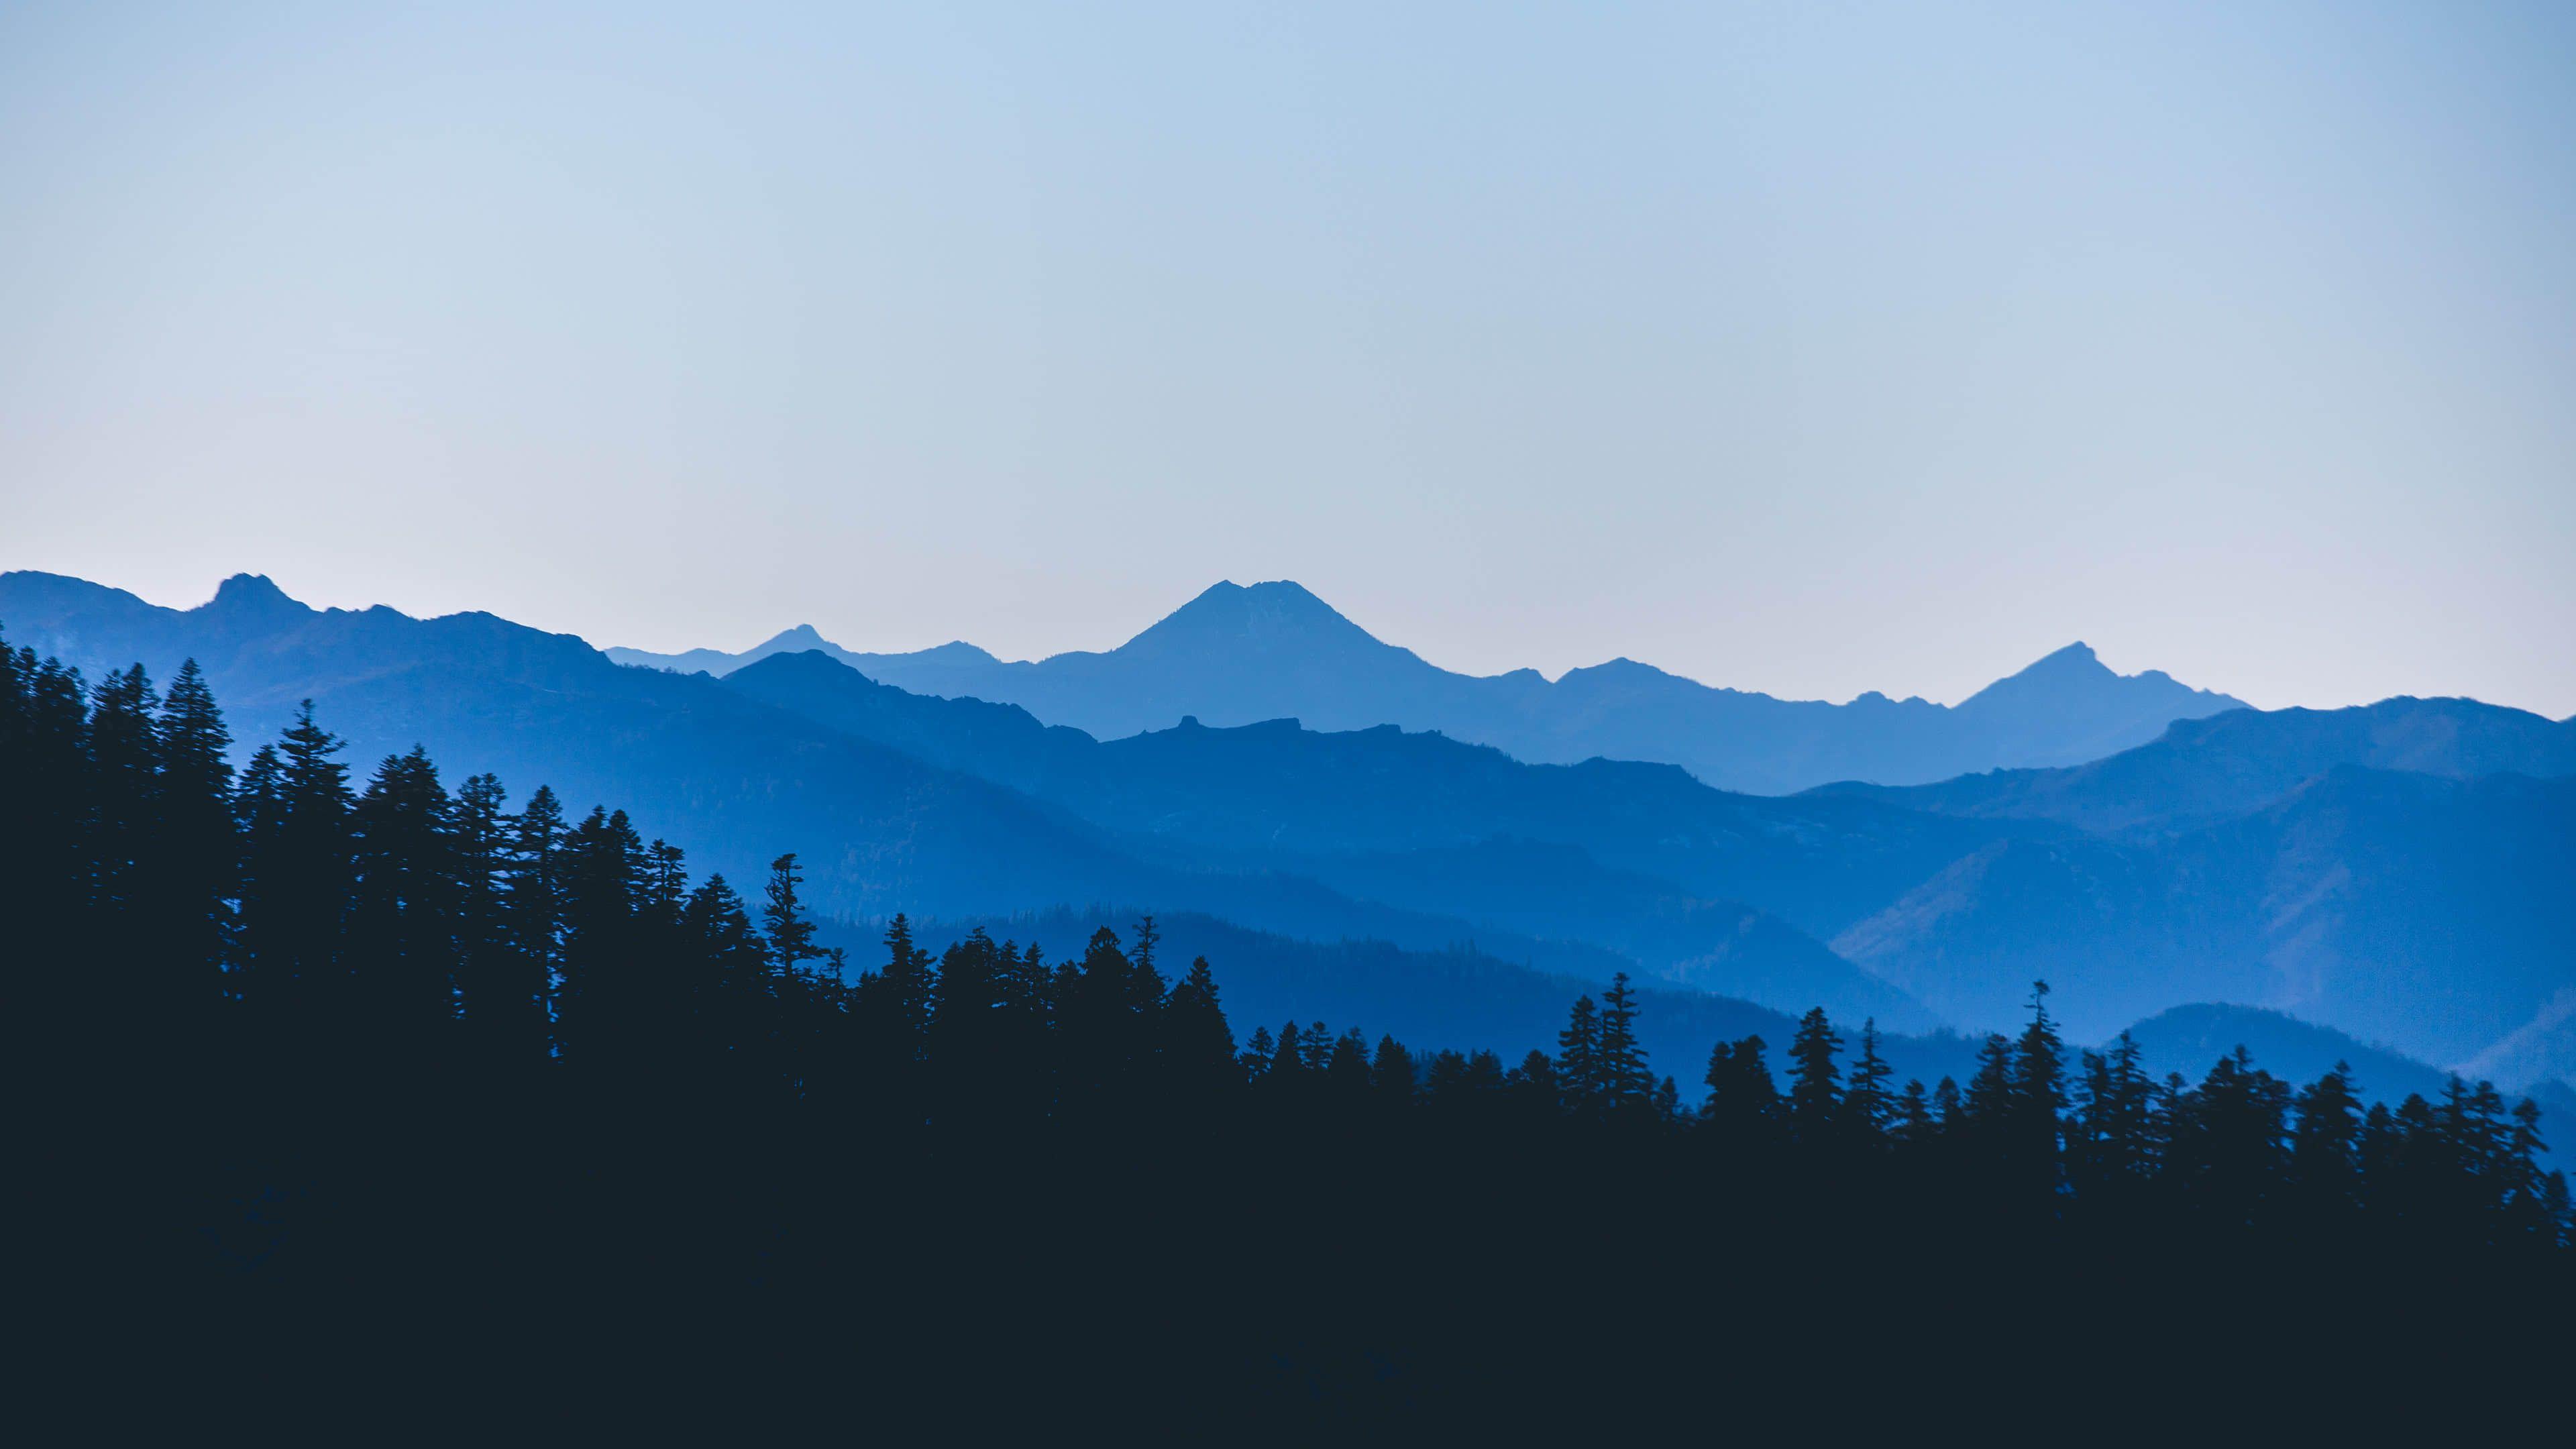 50 Mobile Laptop And Desktop Wallpaper Hd High Resolution Landscape Wallpaper Forest Landscape Mountain Wallpaper